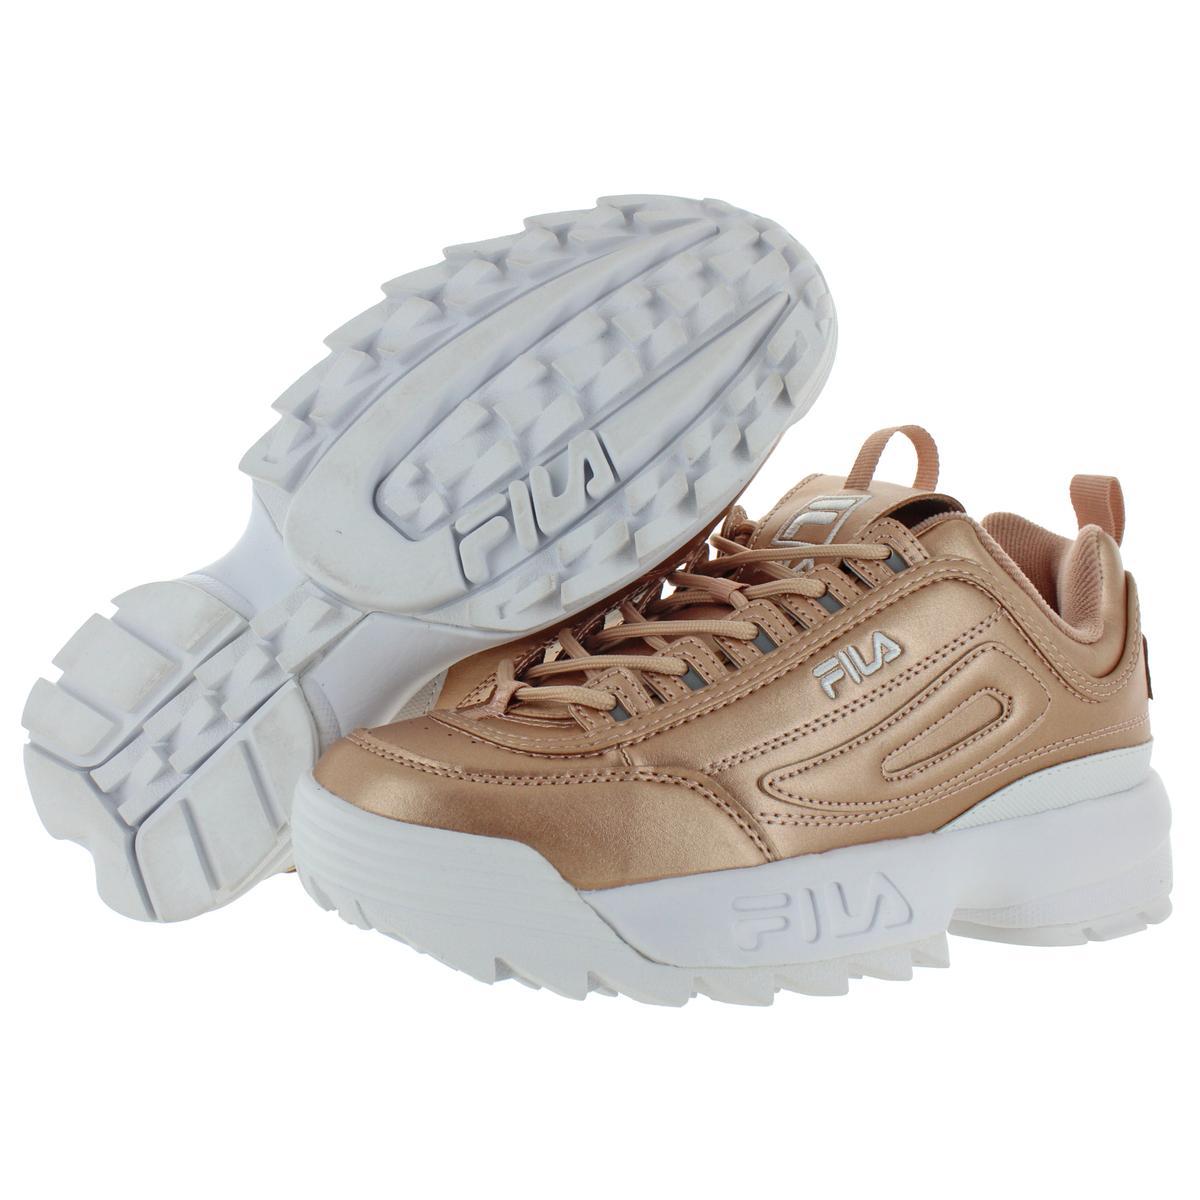 Fila-Womens-Disruptor-II-Premium-Metallic-Trainers-Sneakers-Shoes-BHFO-5237 thumbnail 11